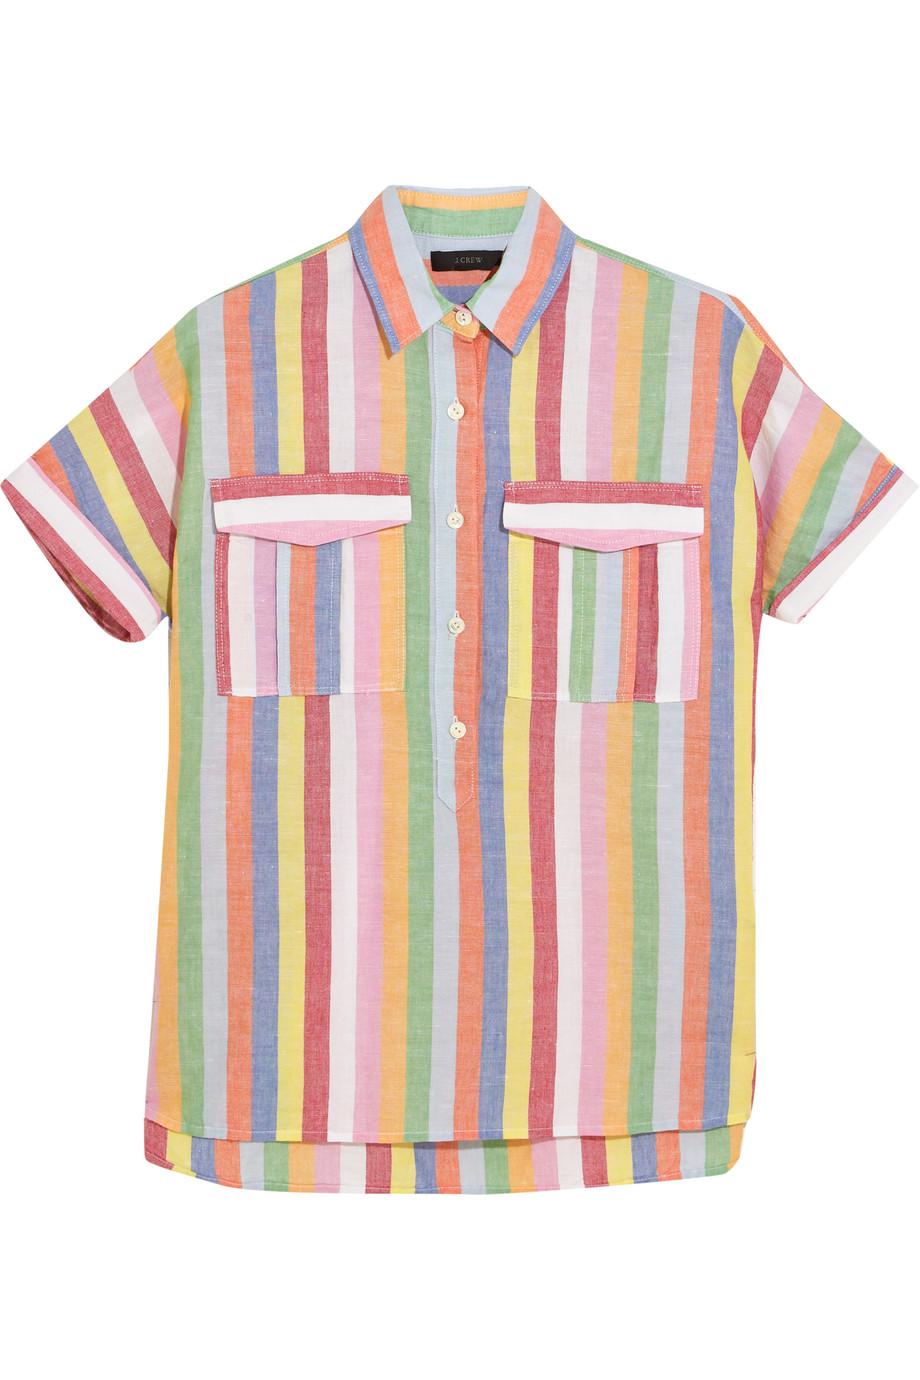 J.Crew Striped Cotton, Ramie and Linen-Blend Shirt, Pink/Mint, Women's, Size: 10